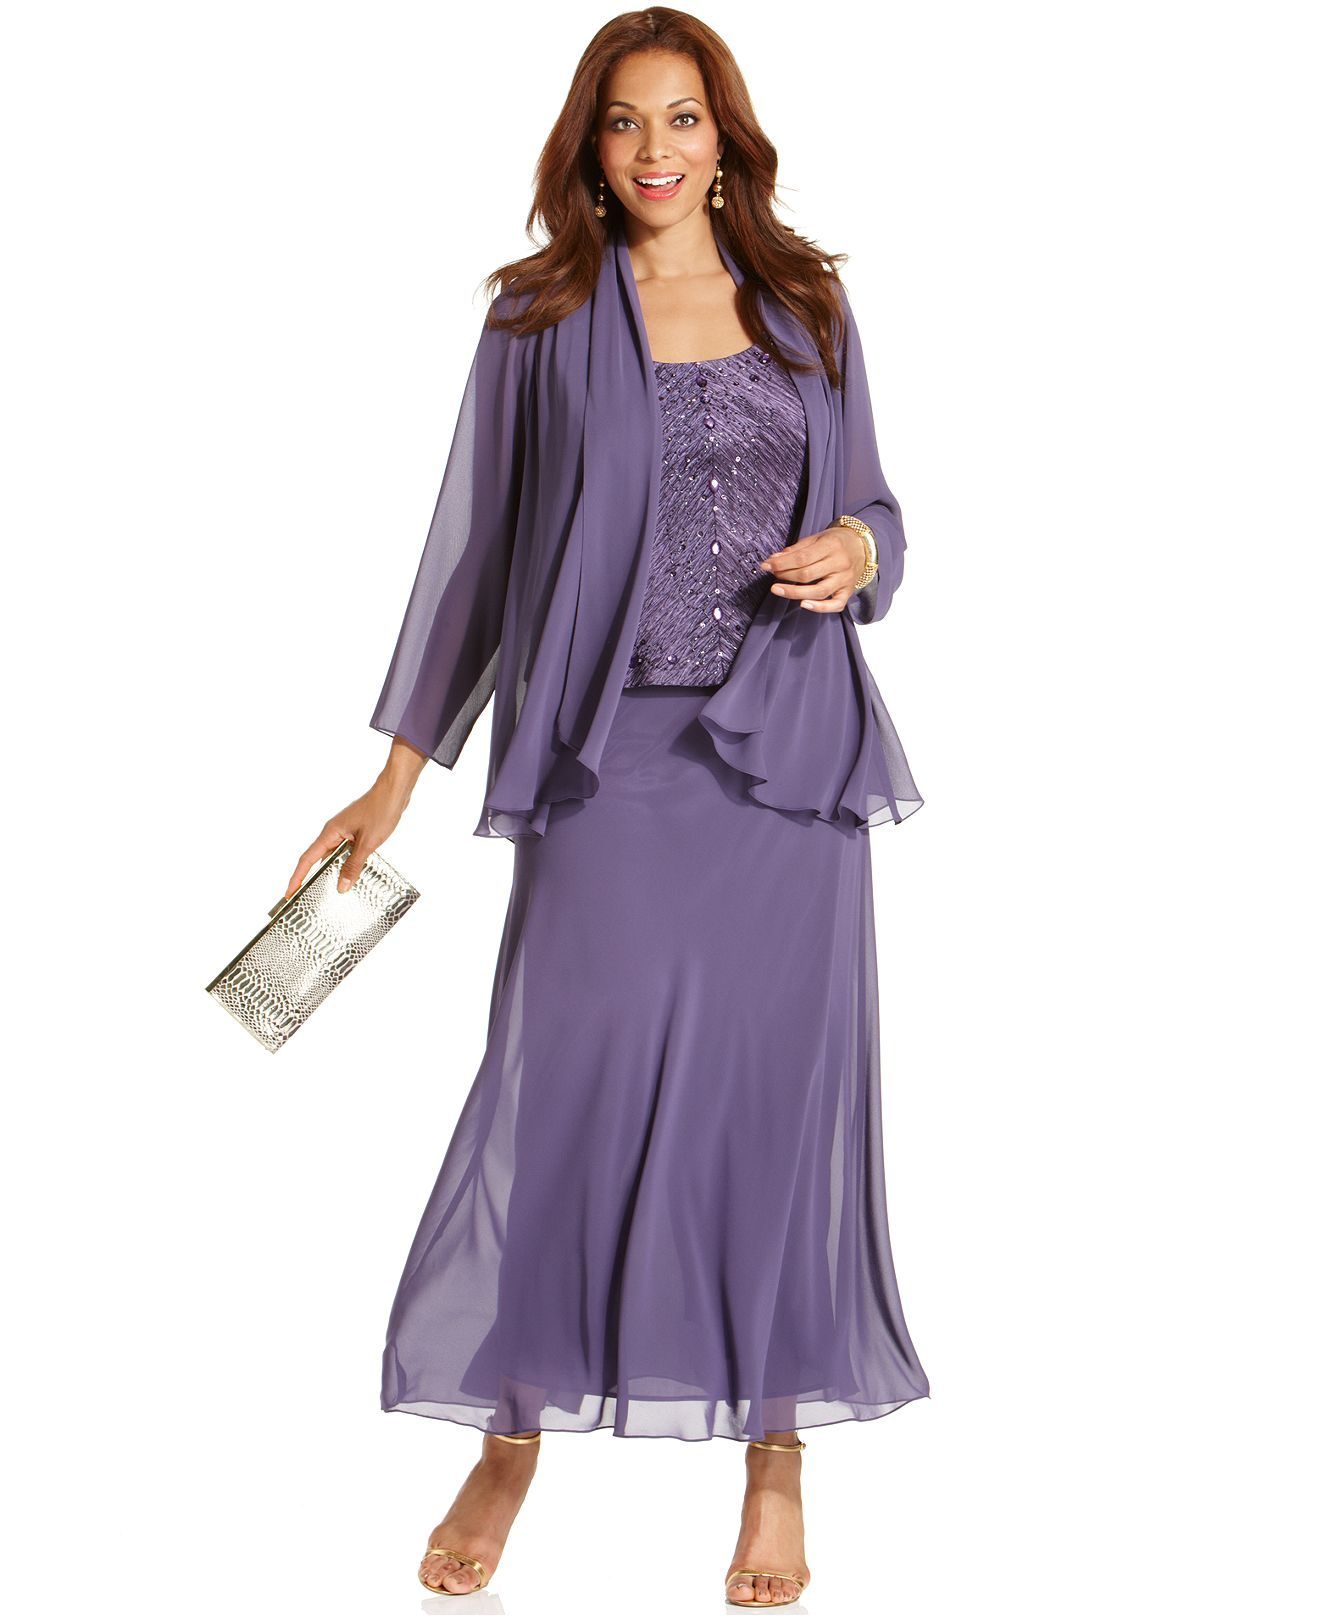 Mother of the bride dresses evening wedding  Patra Dress u Jacket Beaded Bodice  Stylinu  Pinterest  Bride